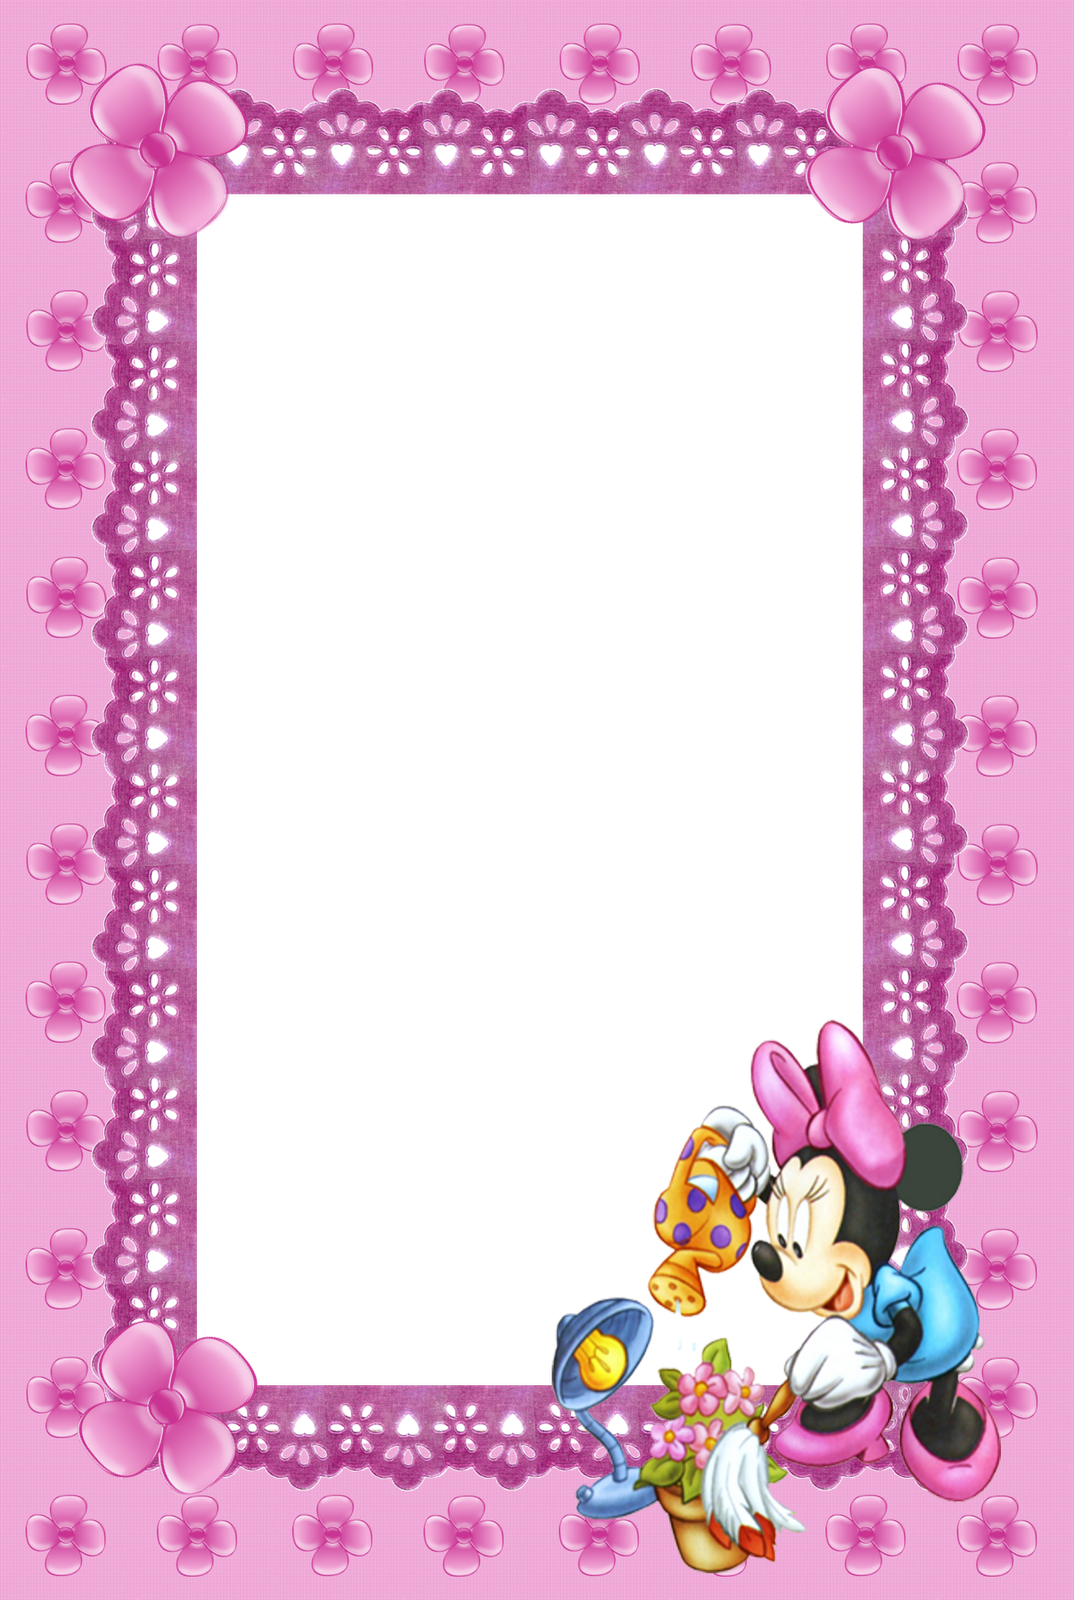 Cute Kids Prink Mini Mouse Transparent Frame | Marcos✨ | Pinterest